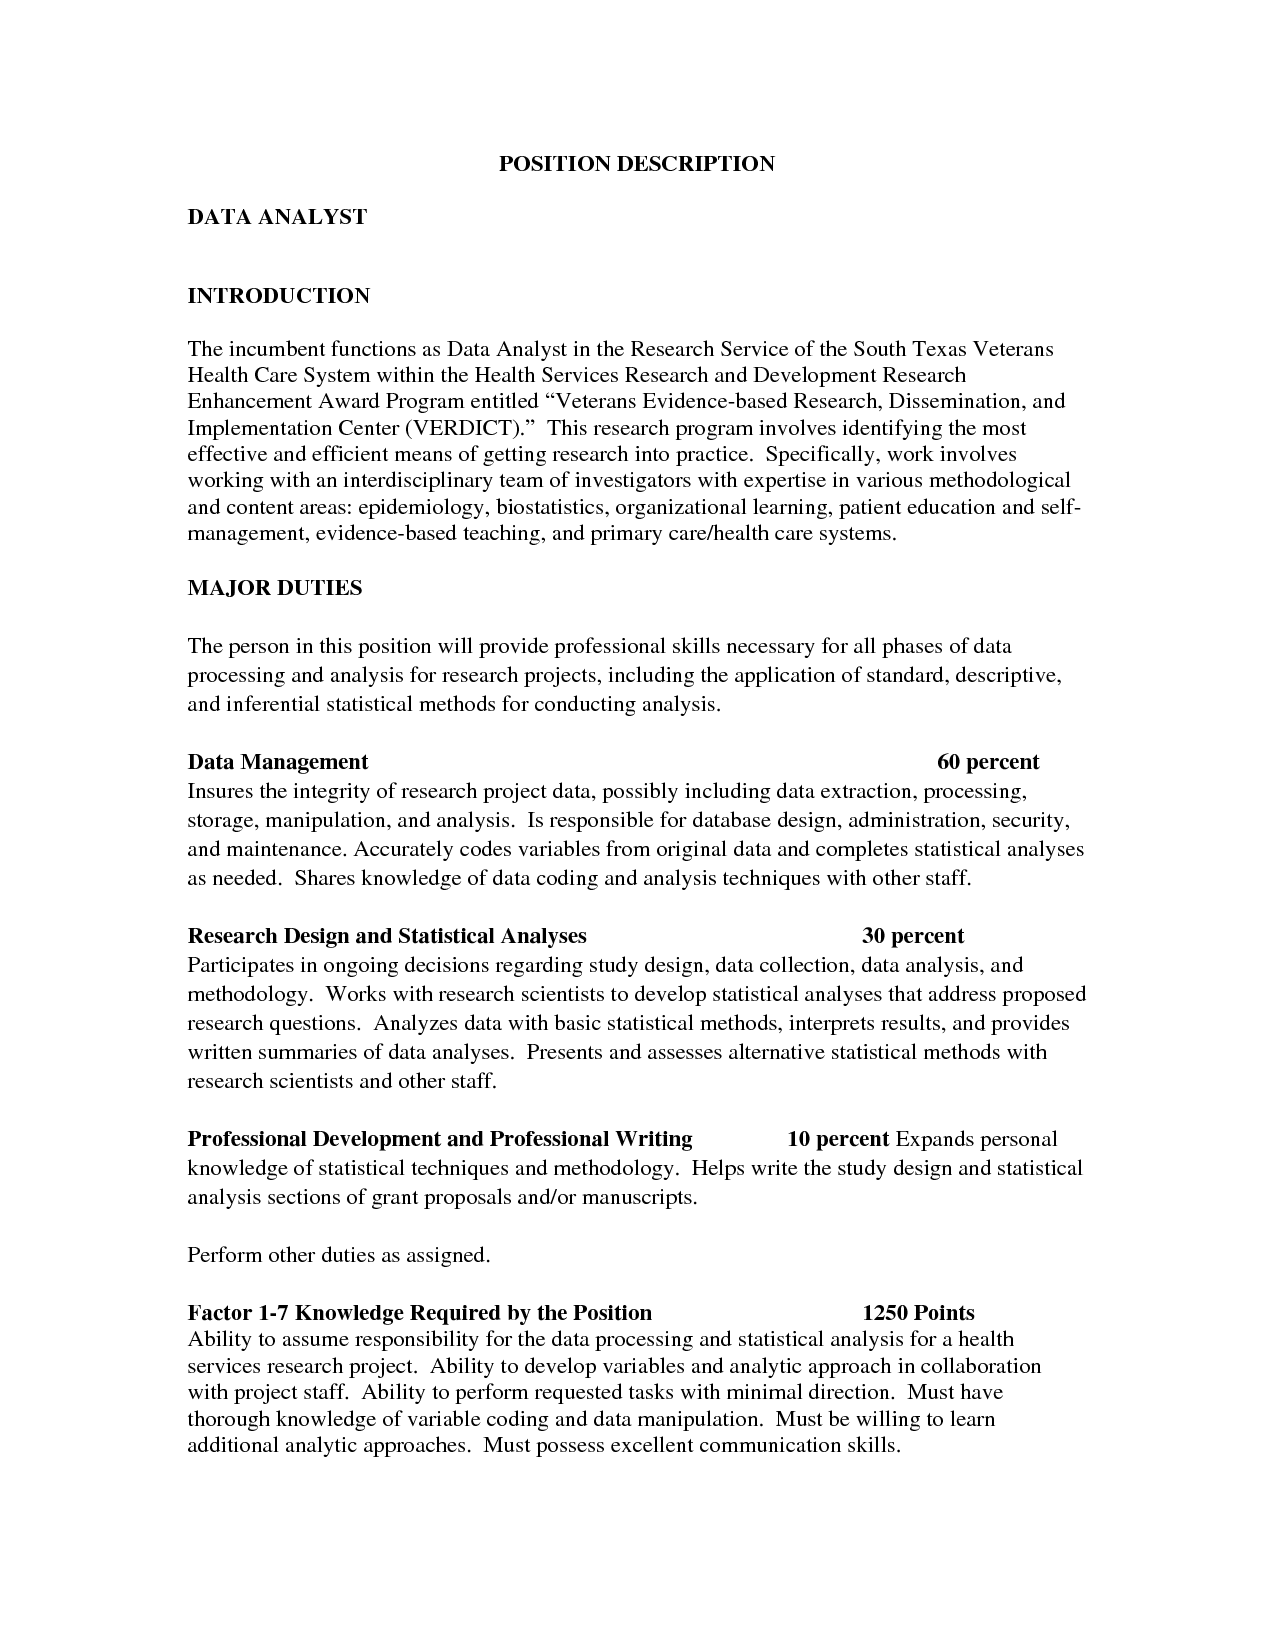 Sample Cover Letter For Data Analyst Position